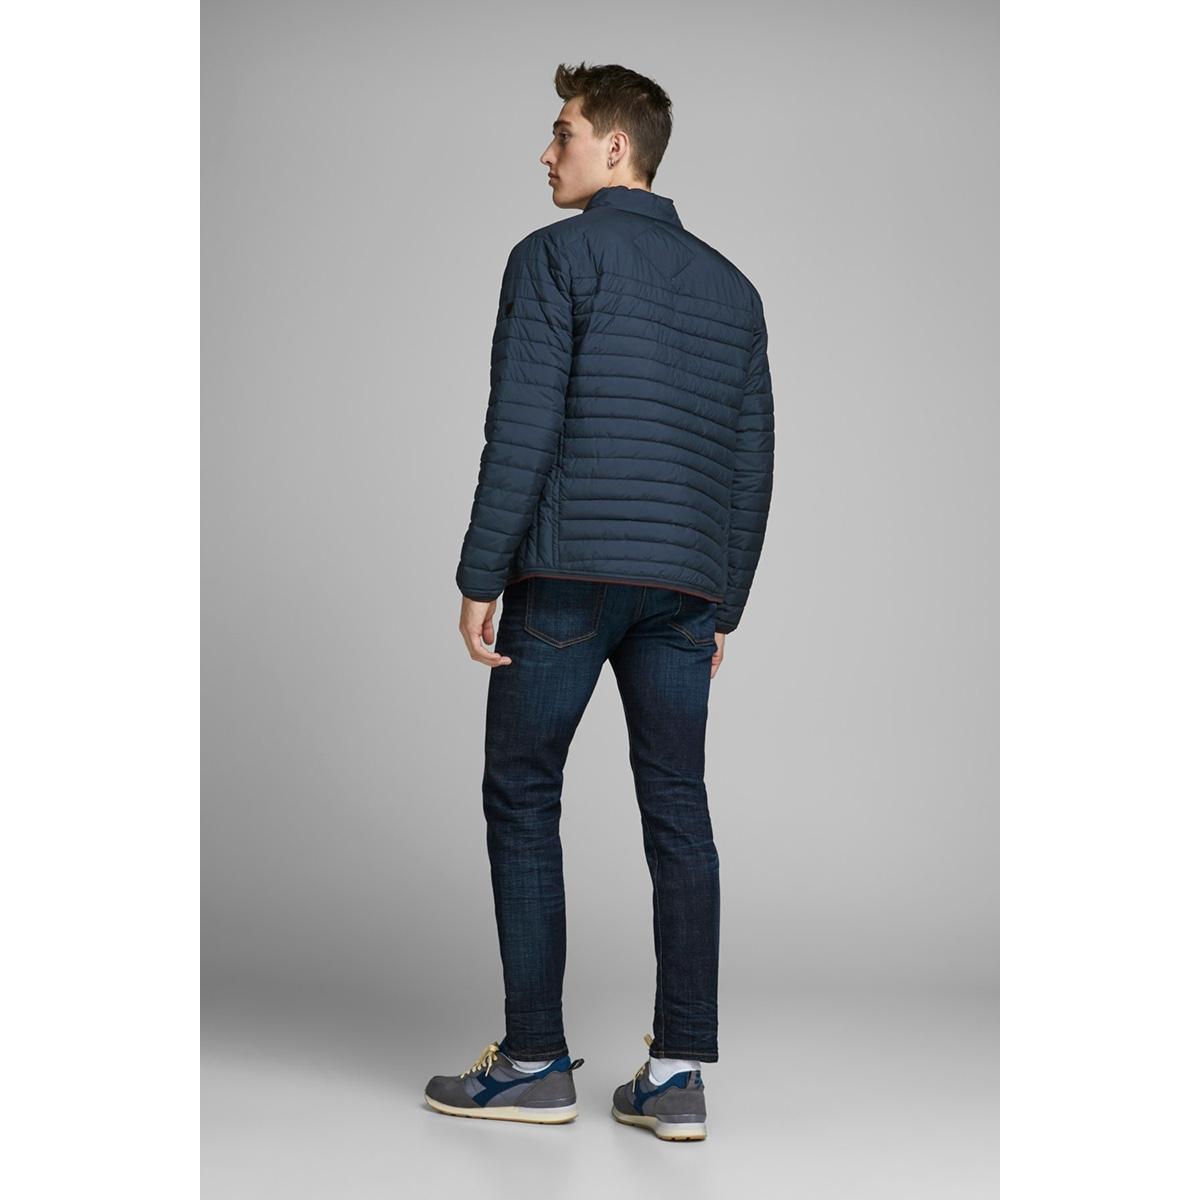 jpruno lightweight jacket blu 12164356 jack & jones jas navy blazer